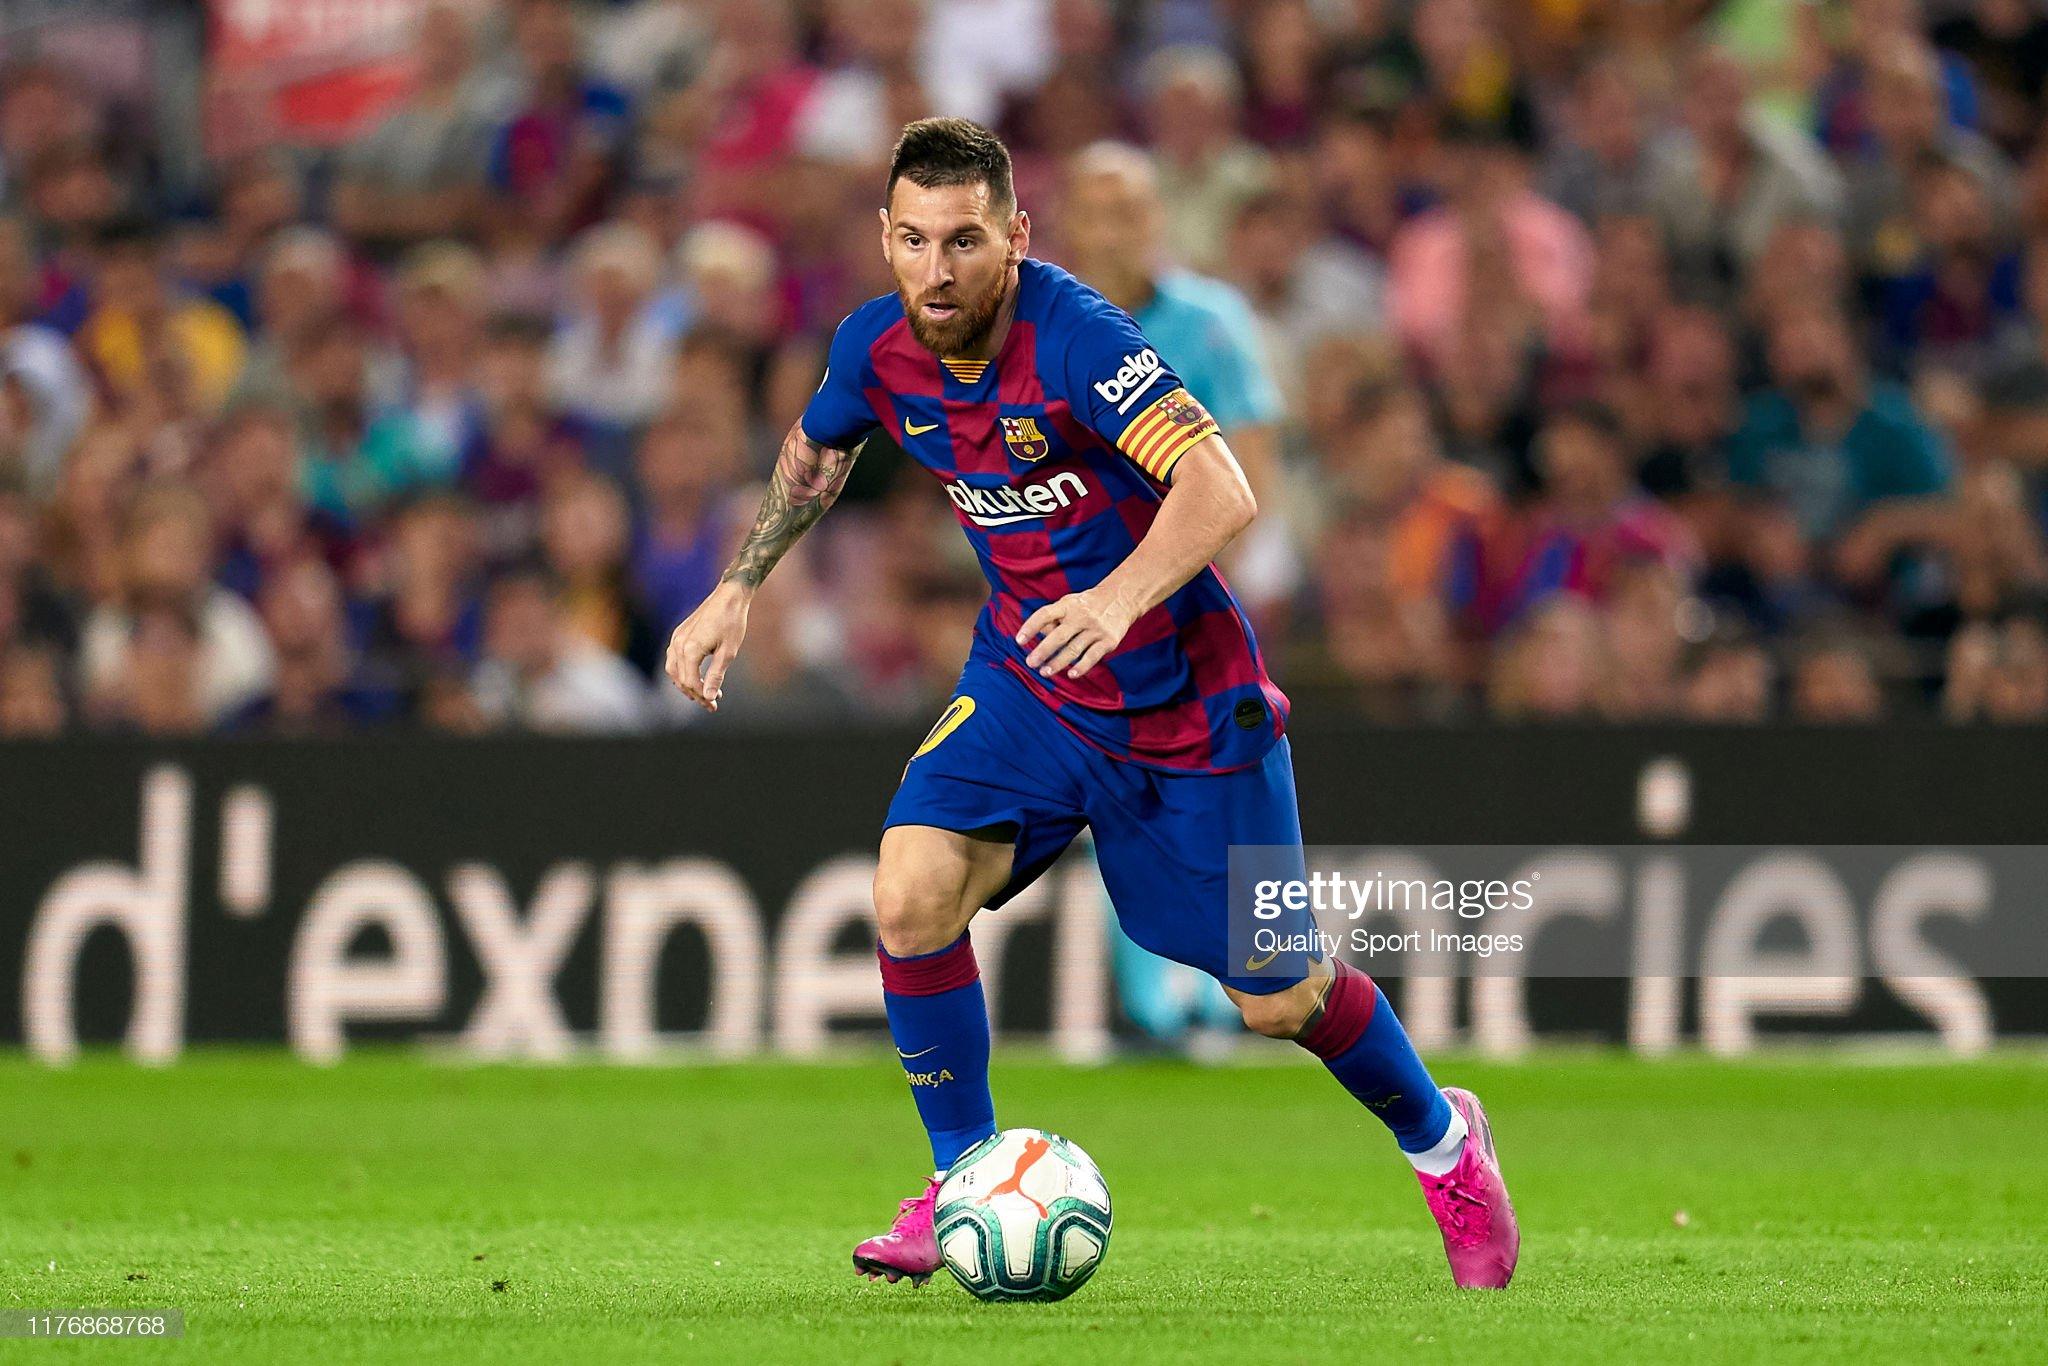 صور مباراة : برشلونة - فياريال 2-1 ( 24-09-2019 )  Lionel-messi-of-fc-barcelona-with-the-ball-during-the-liga-match-fc-picture-id1176868768?s=2048x2048